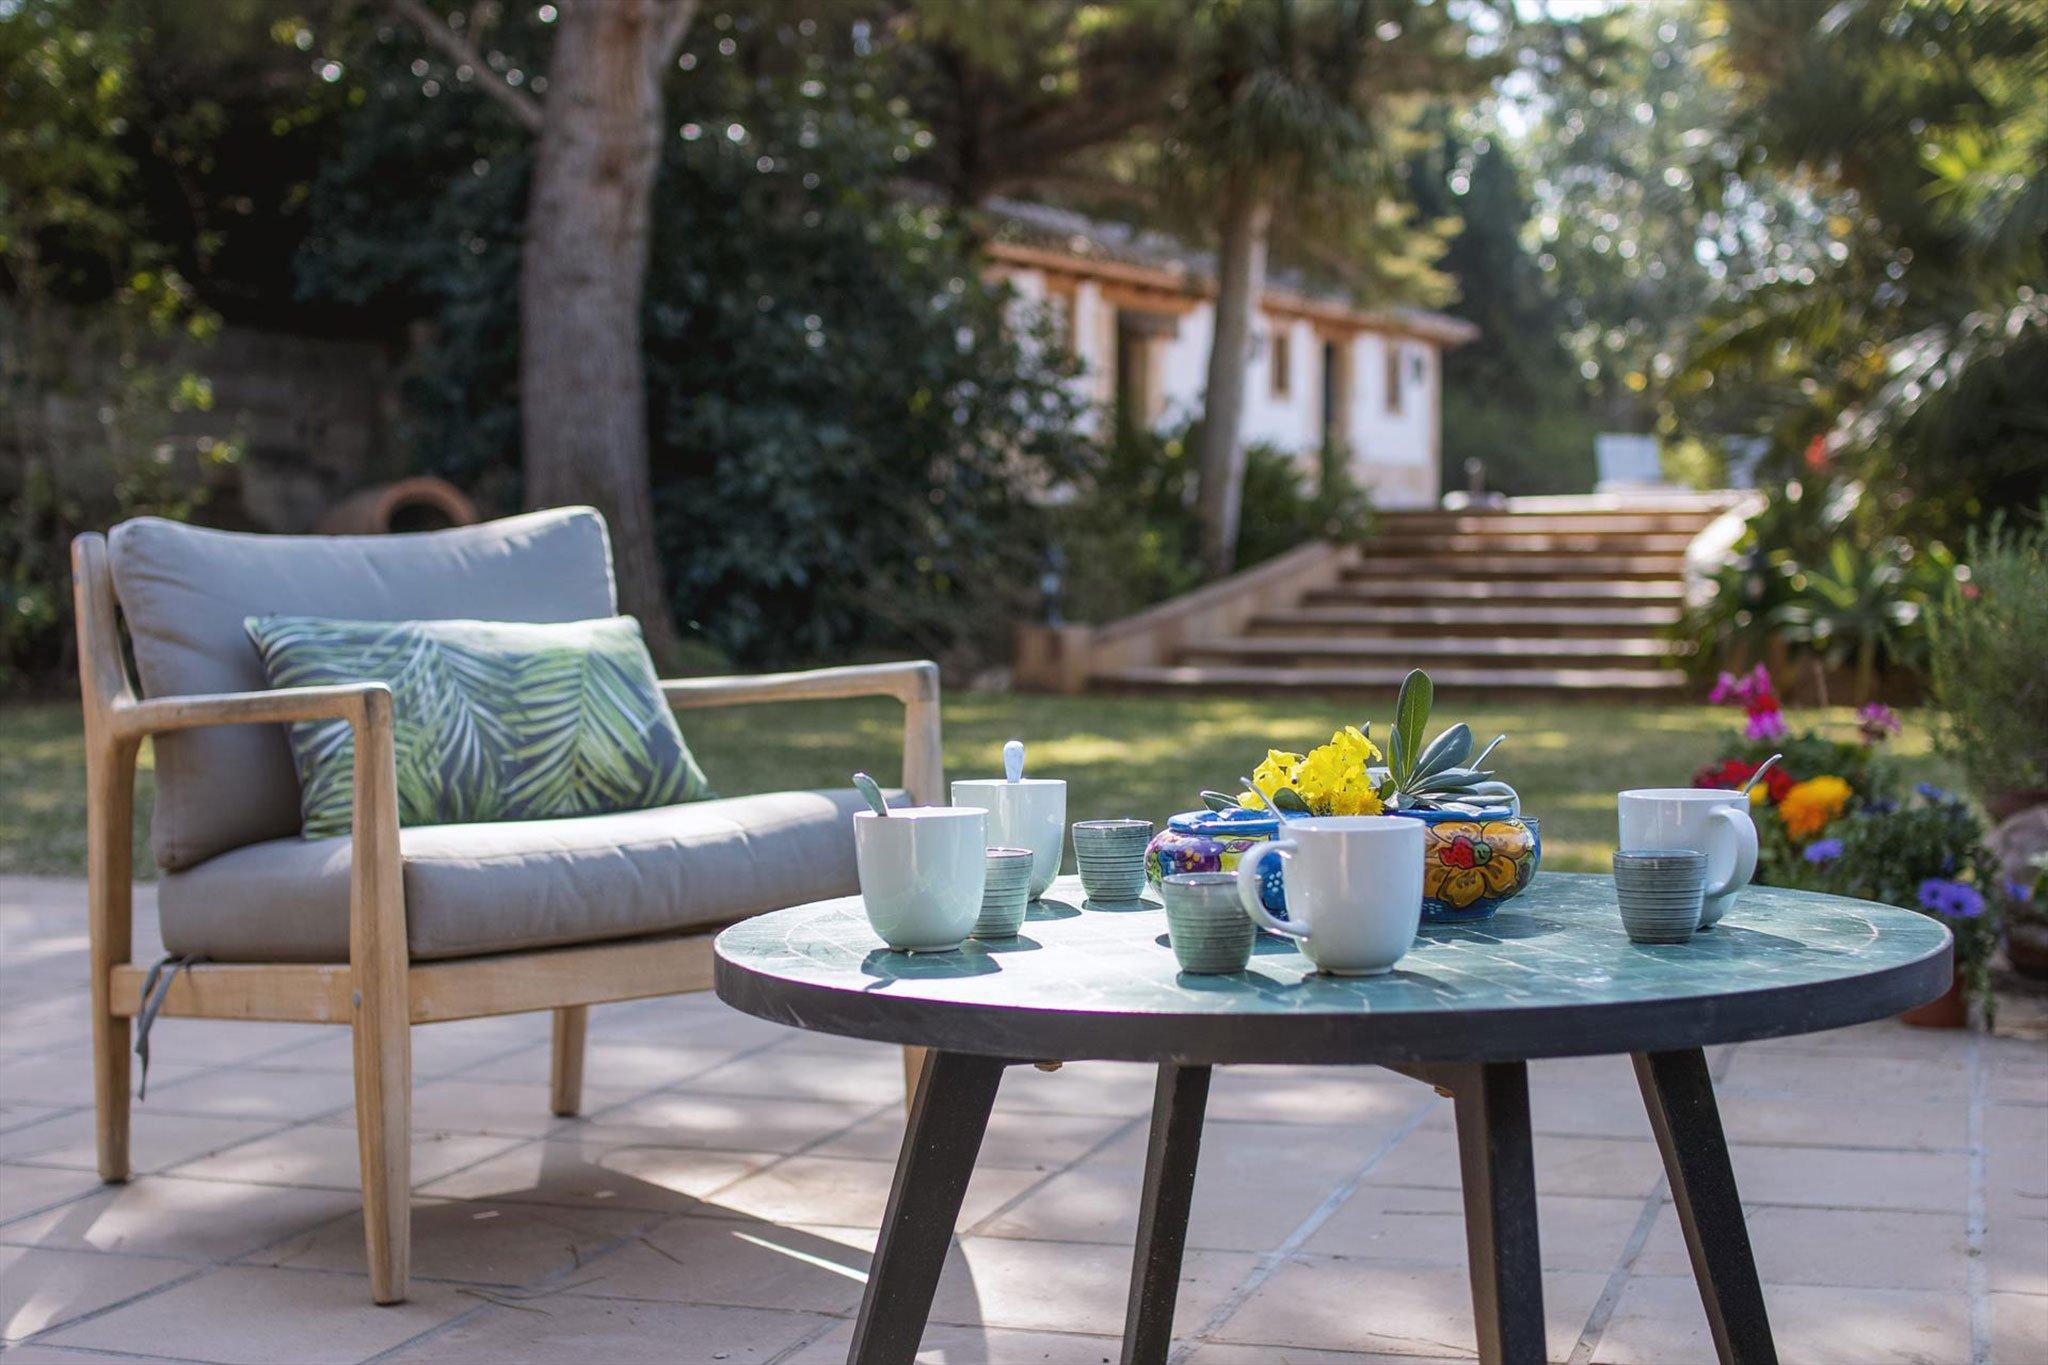 Rincón en una finca romántica reconstruida ideal para vacaciones en Dénia – Aguila Rent a Villa